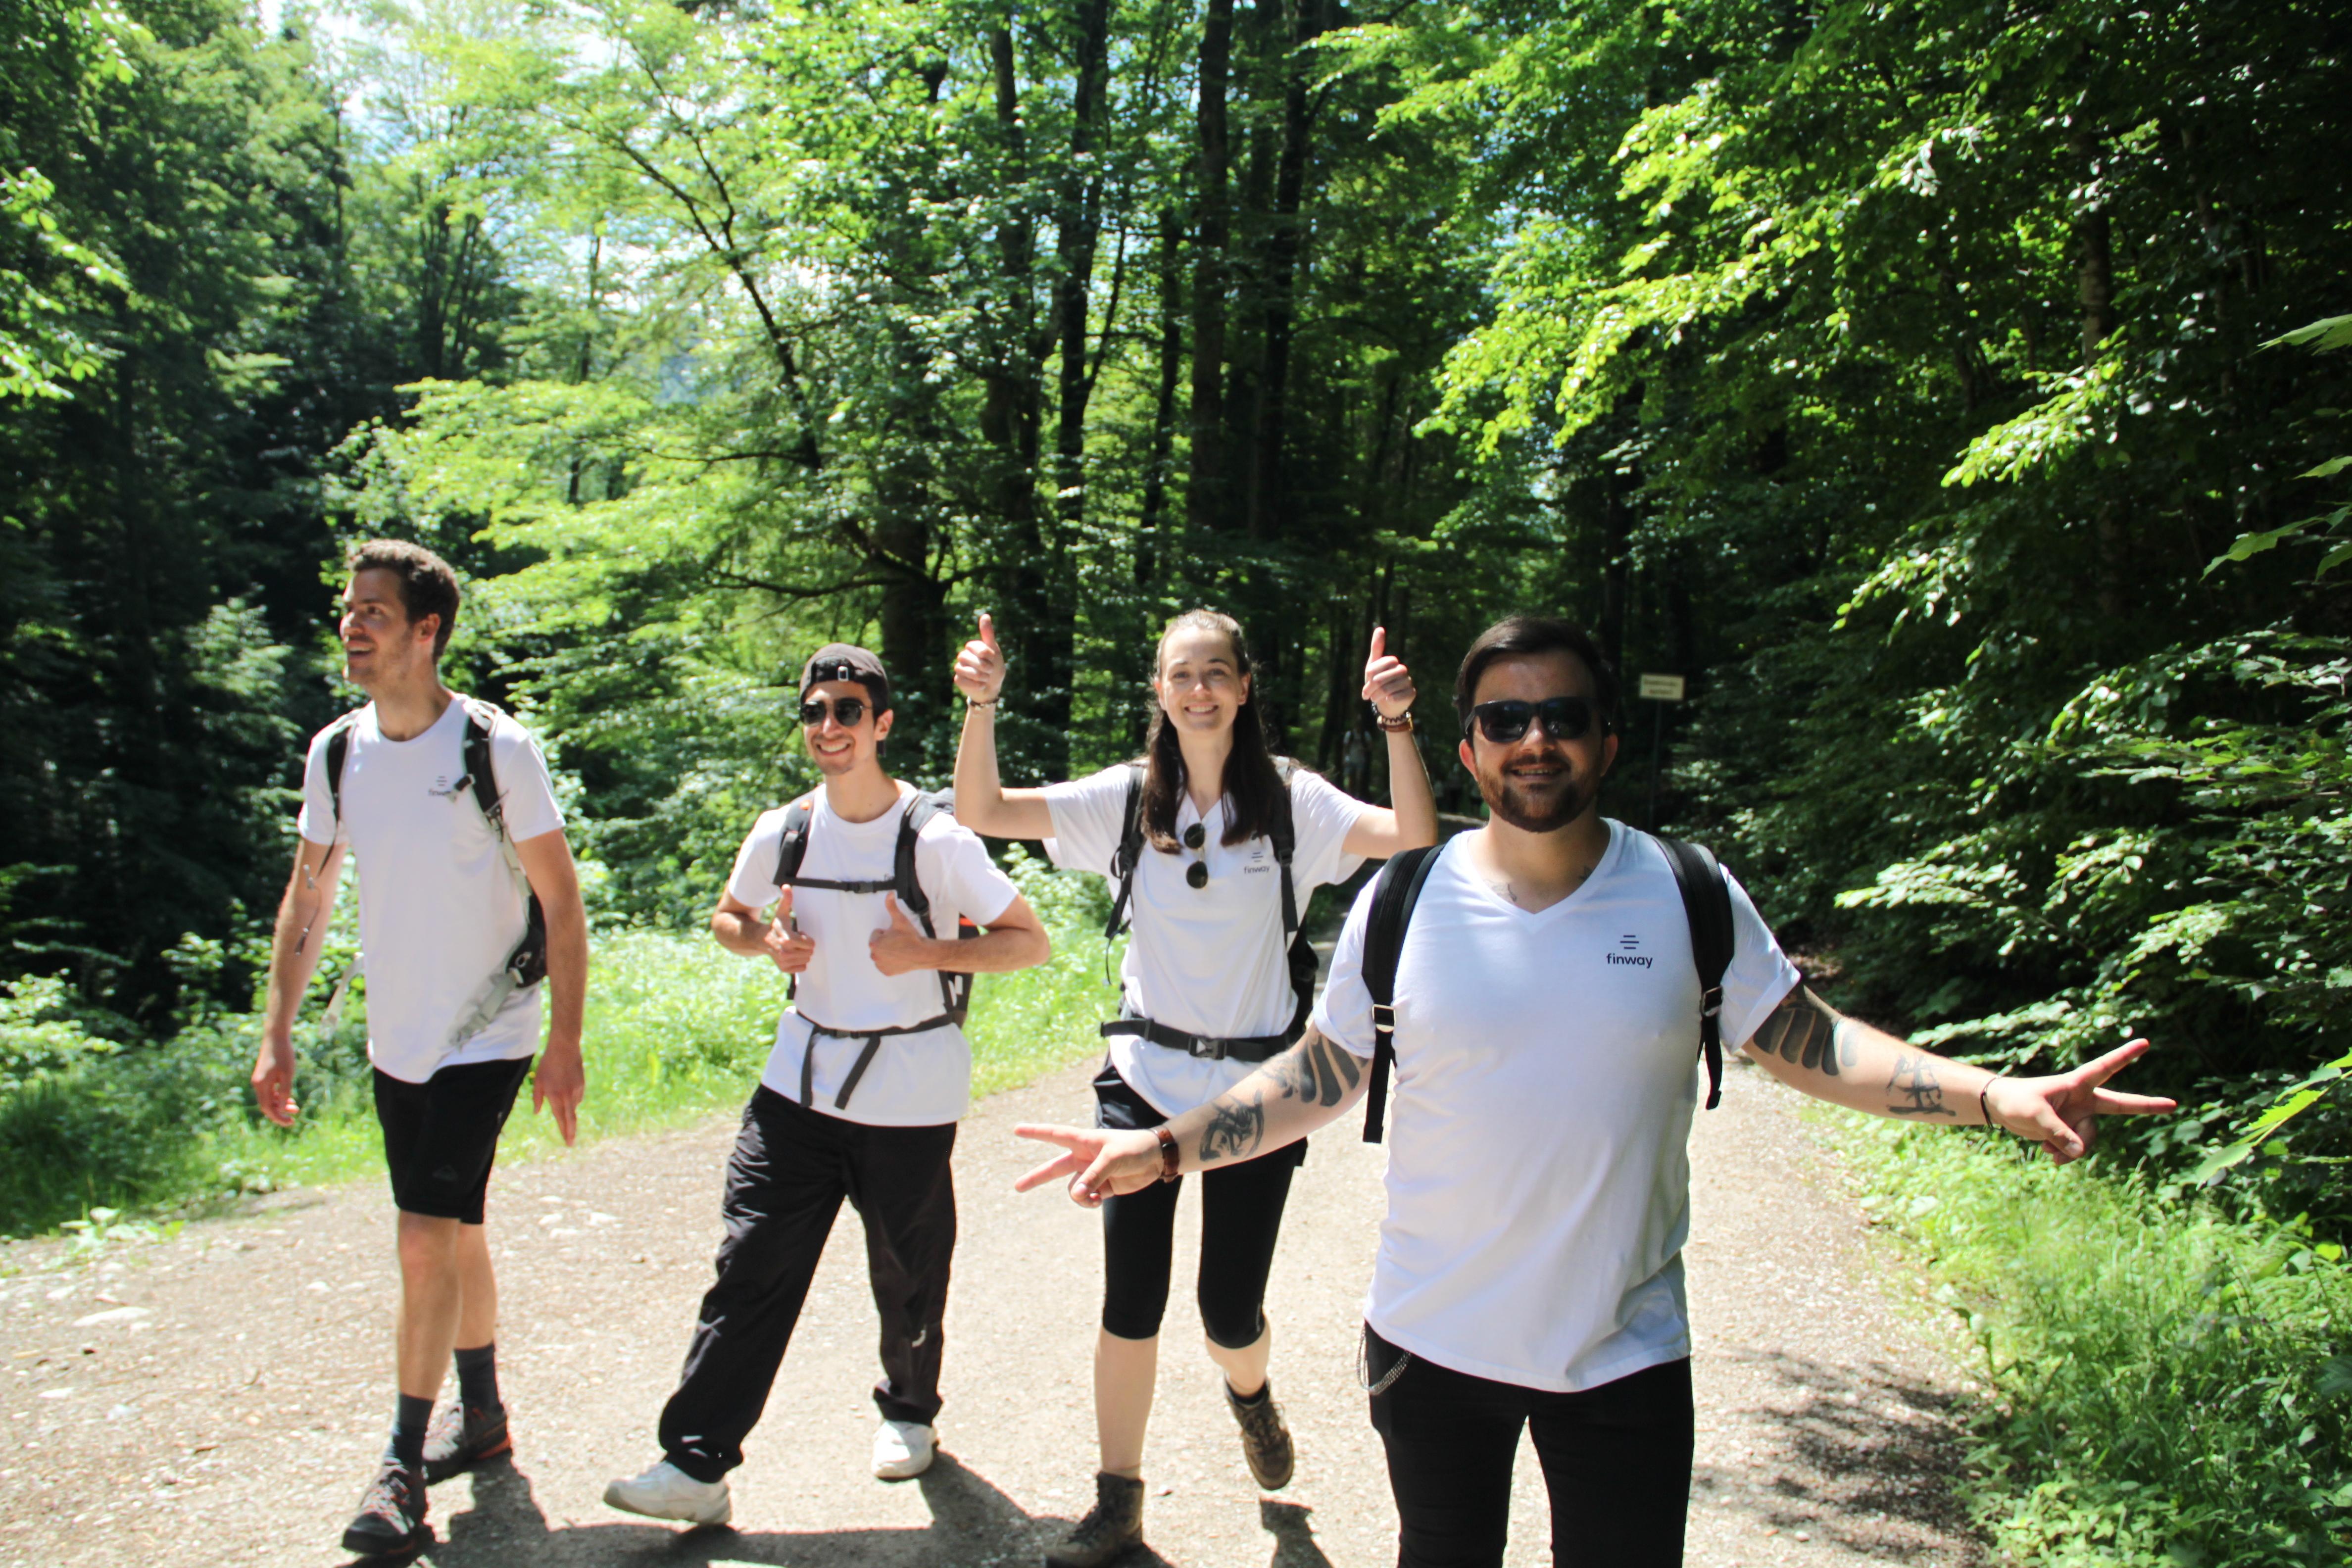 Finway Team Ausflug 2021